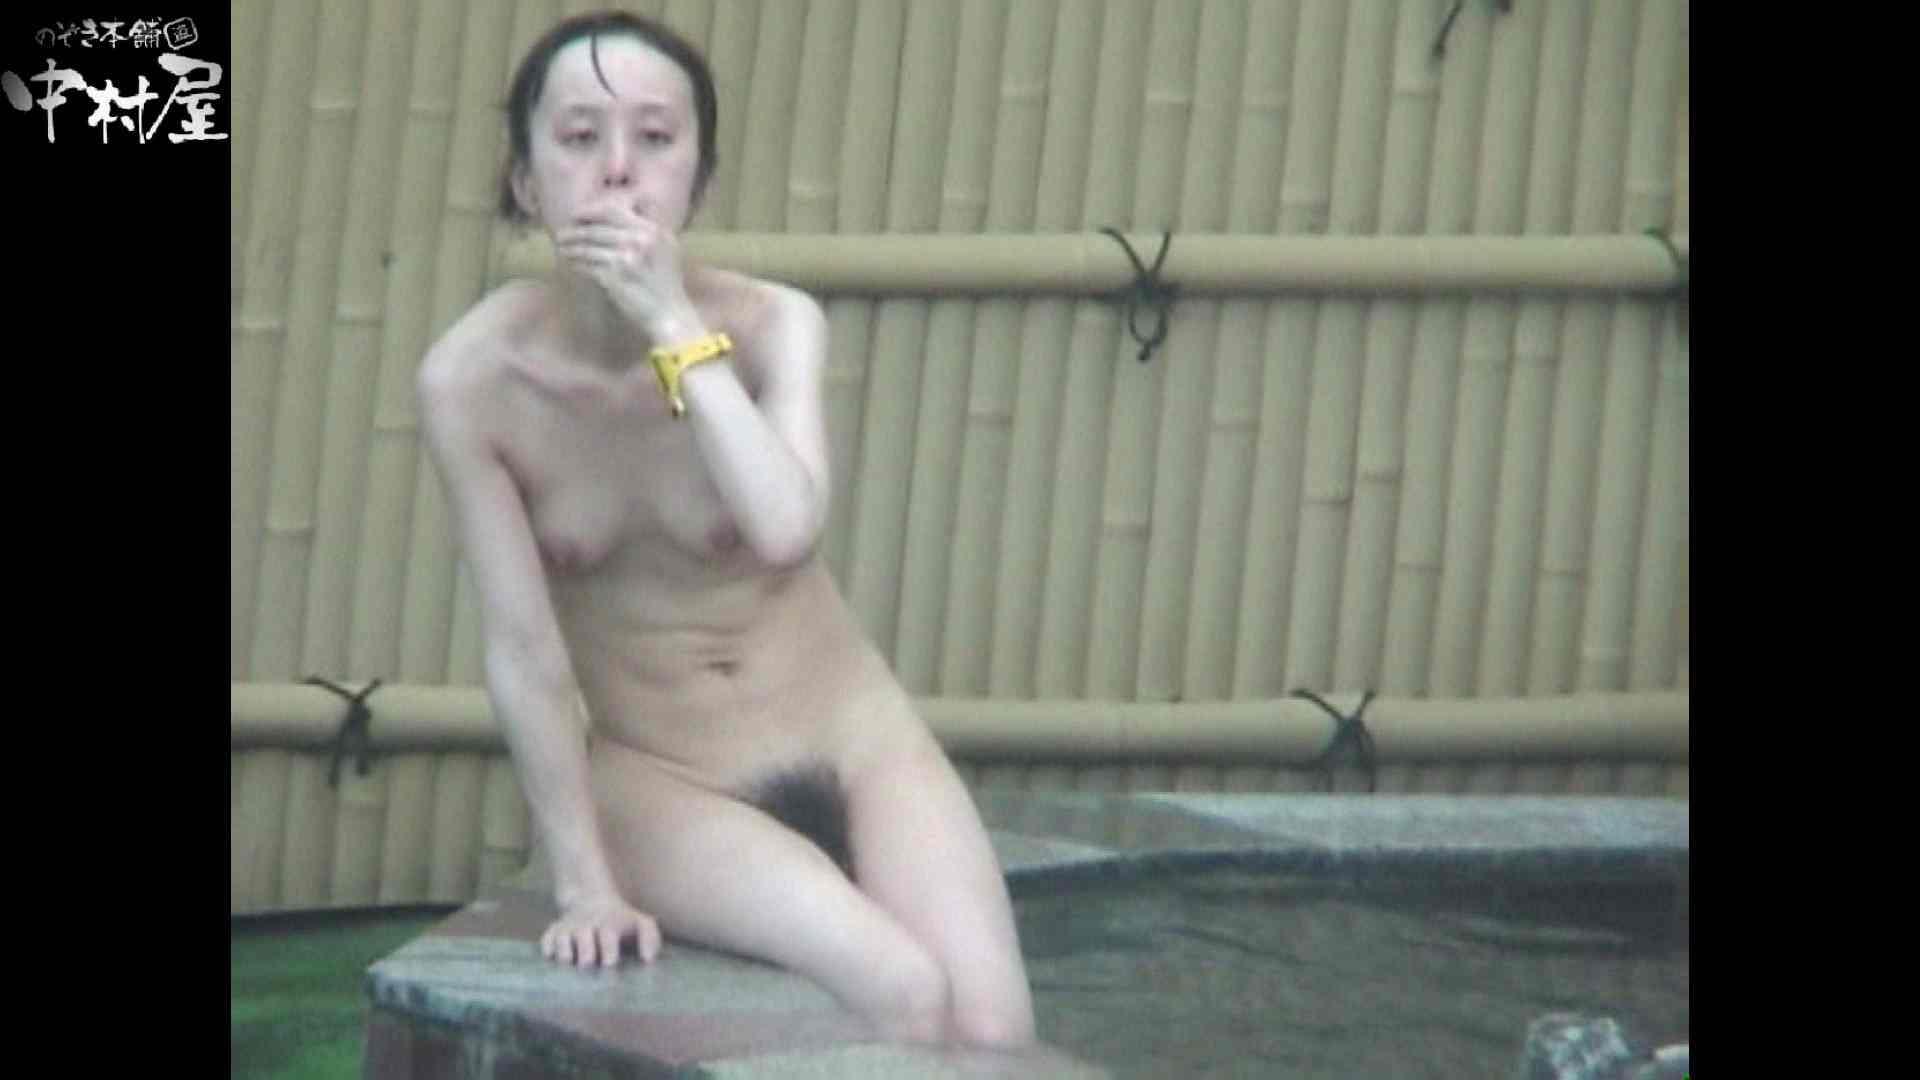 Aquaな露天風呂Vol.973 美しいOLの裸体 性交動画流出 95pic 86